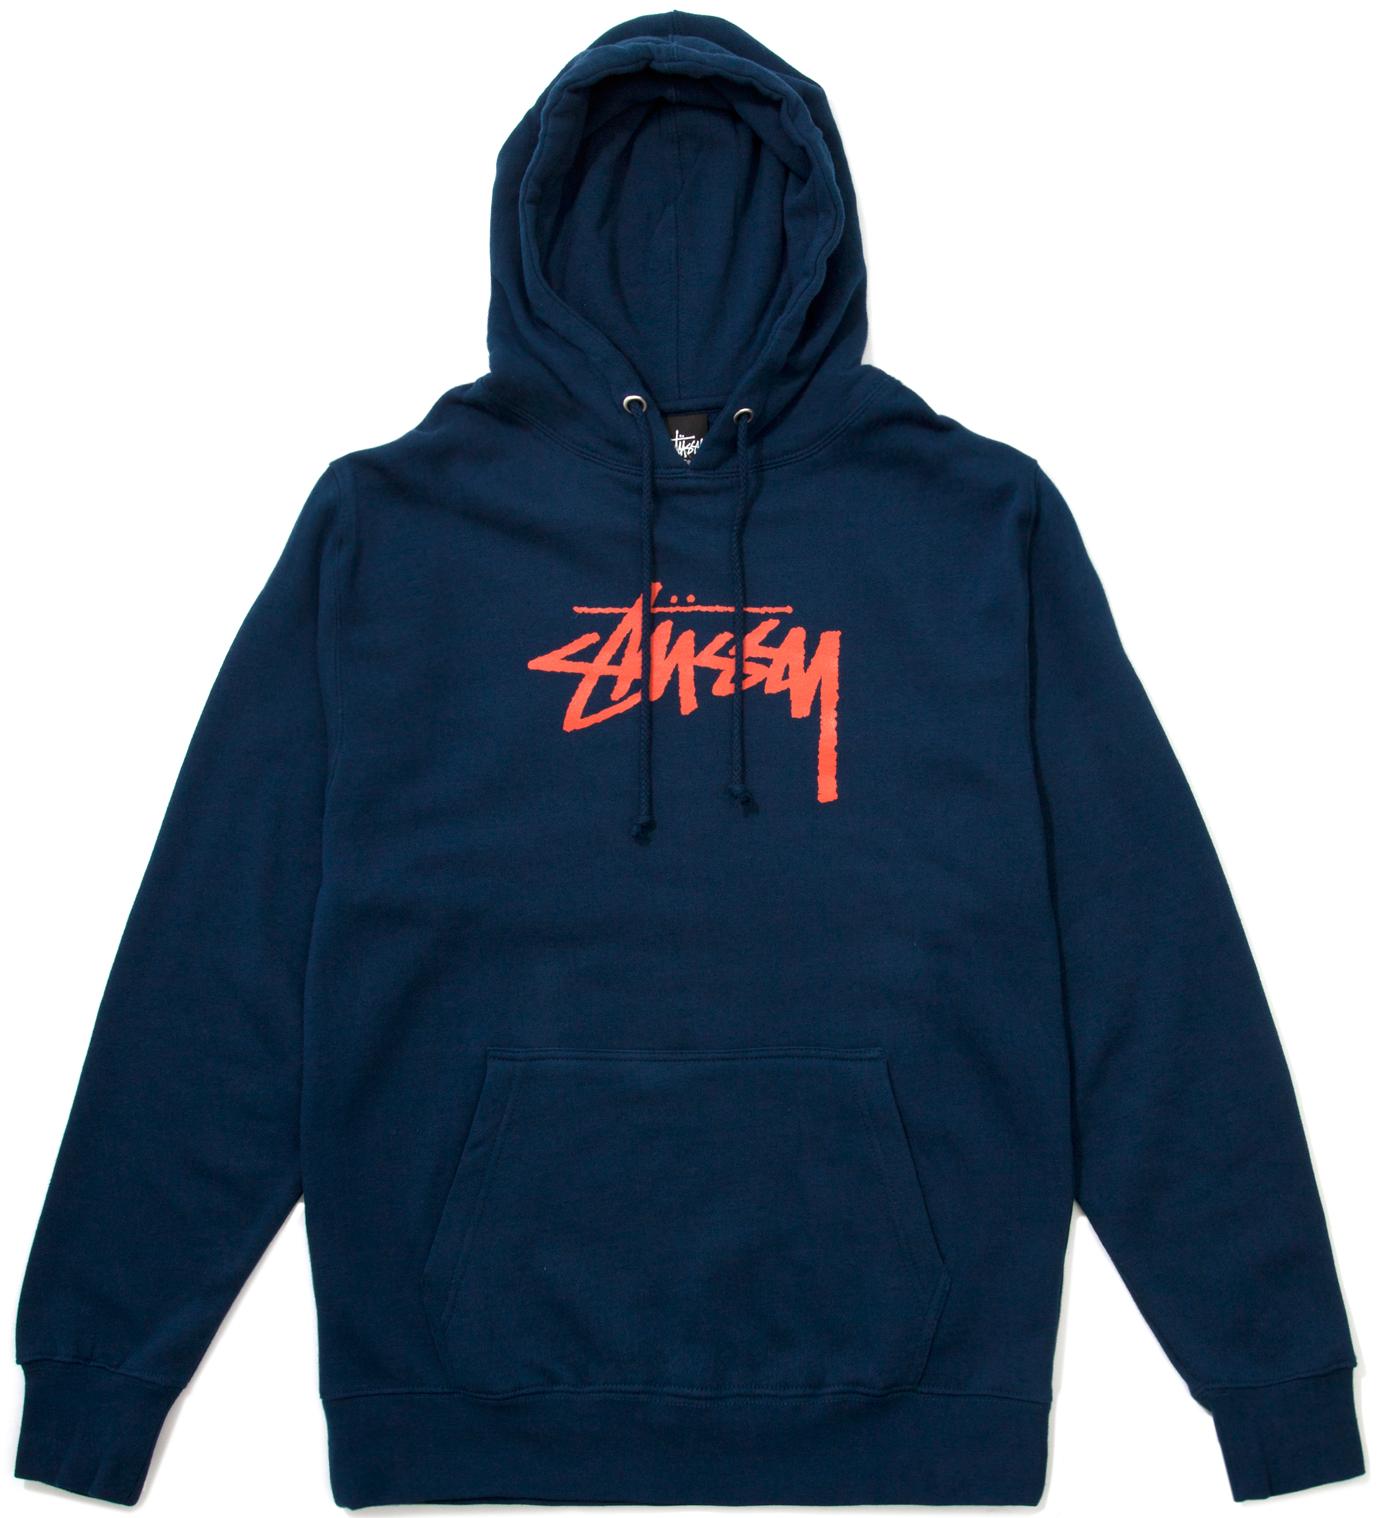 Stussy Indigo Hood Stock Hoodie